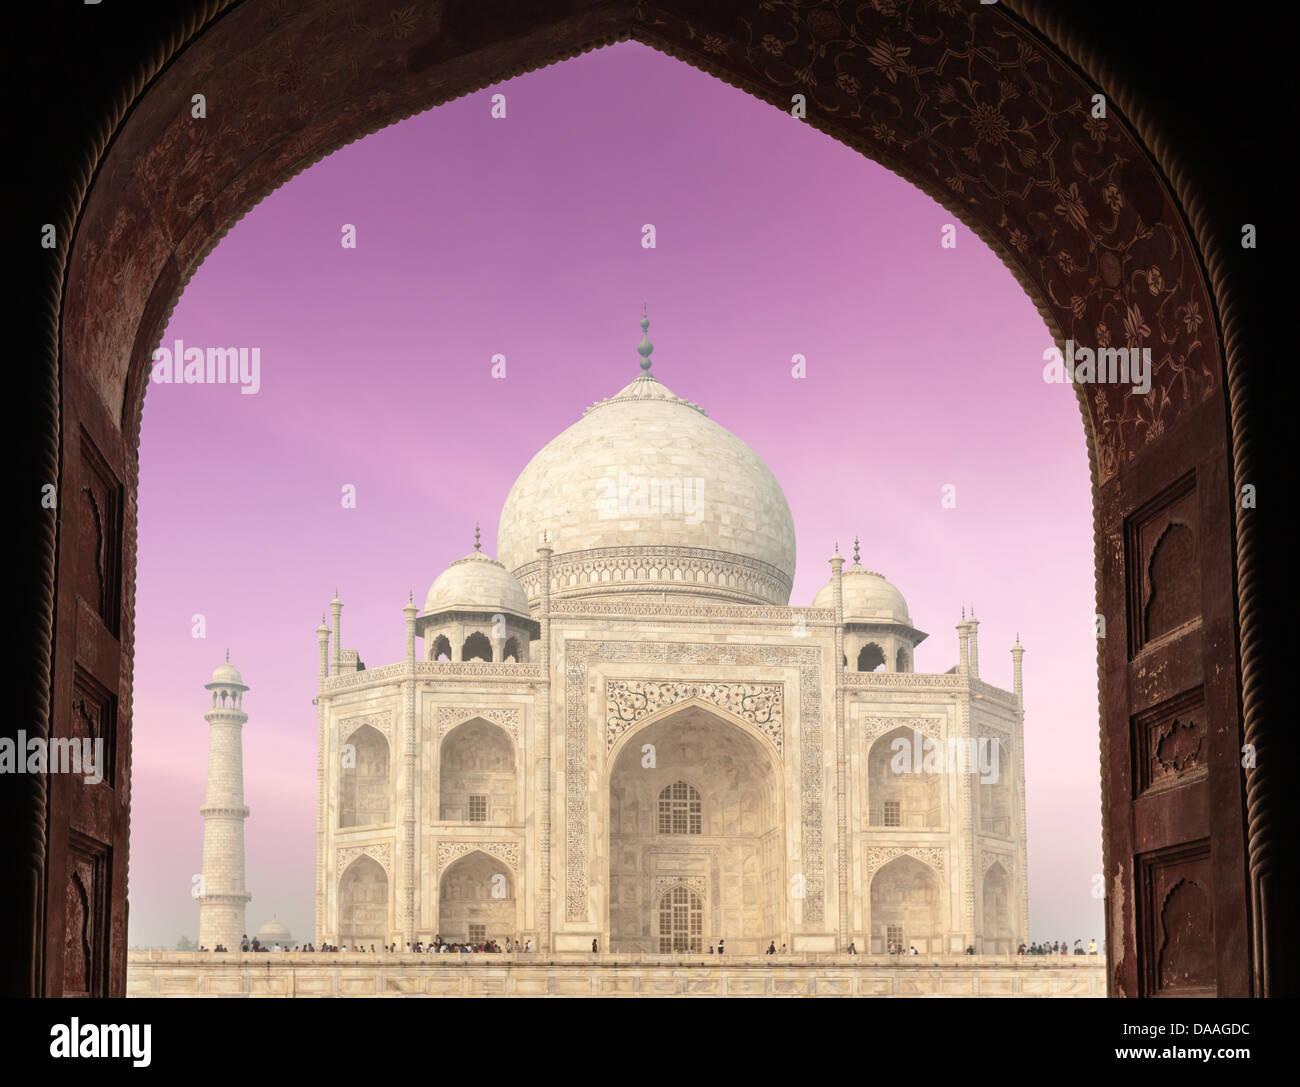 Taj Mahal through arch, Indian Symbol - India travel background. Agra, Uttar Pradesh, India - Stock Image